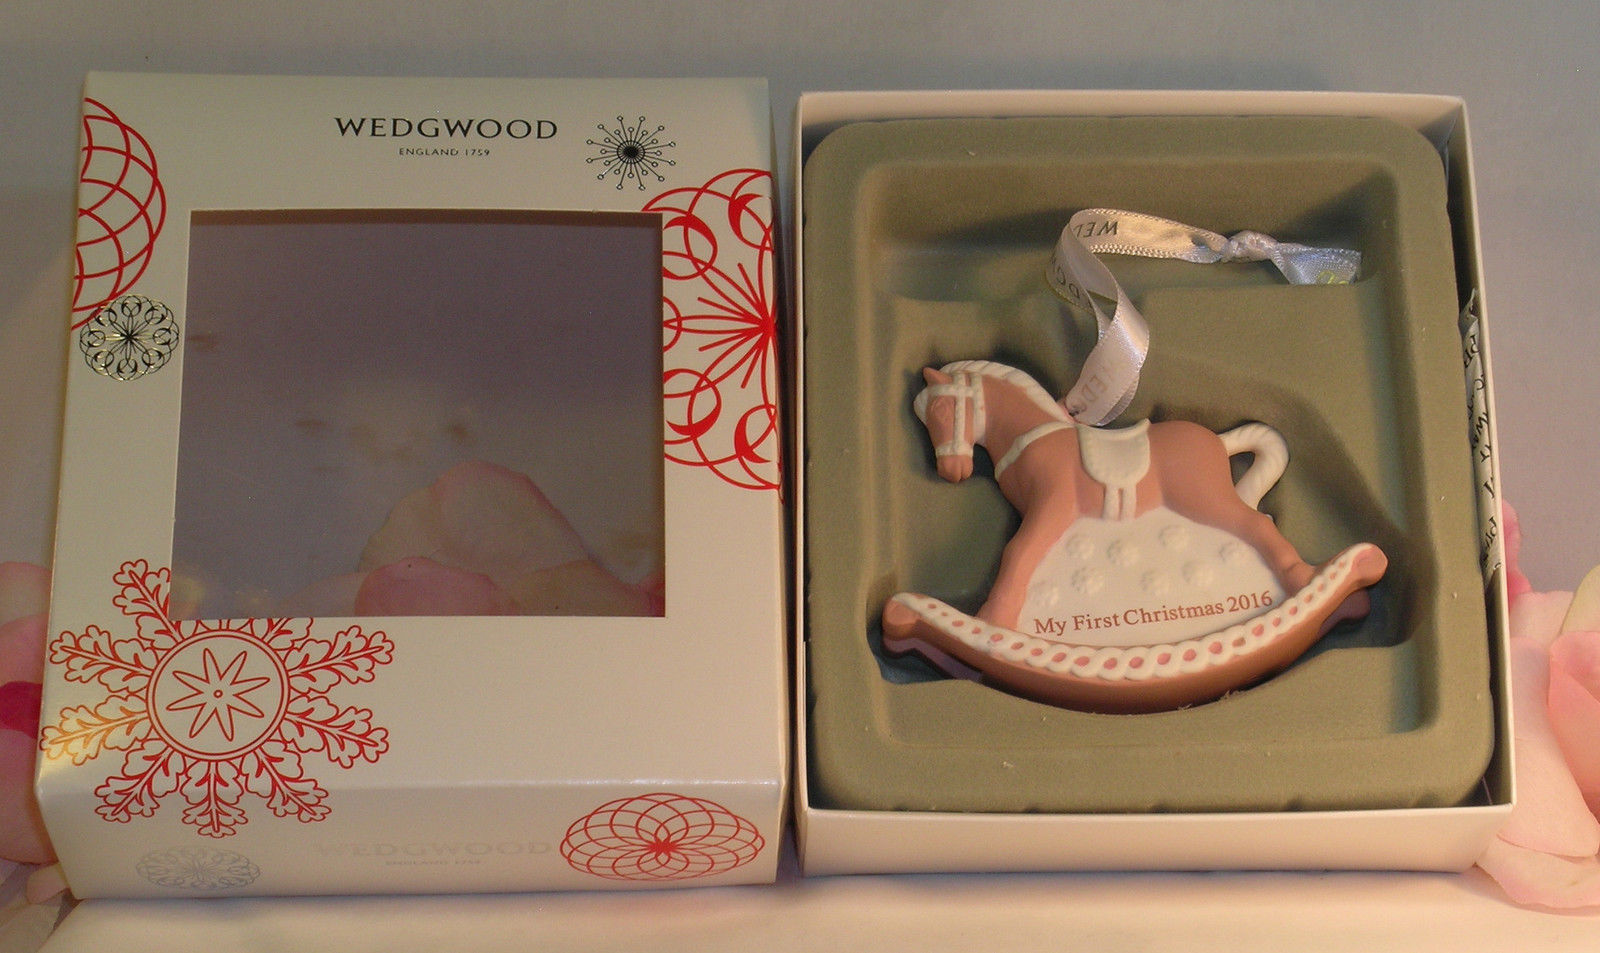 New Wedgwood Pink Jaspeware Baby 1ST First Christmas Rocking Horse Ornament 2016 image 2